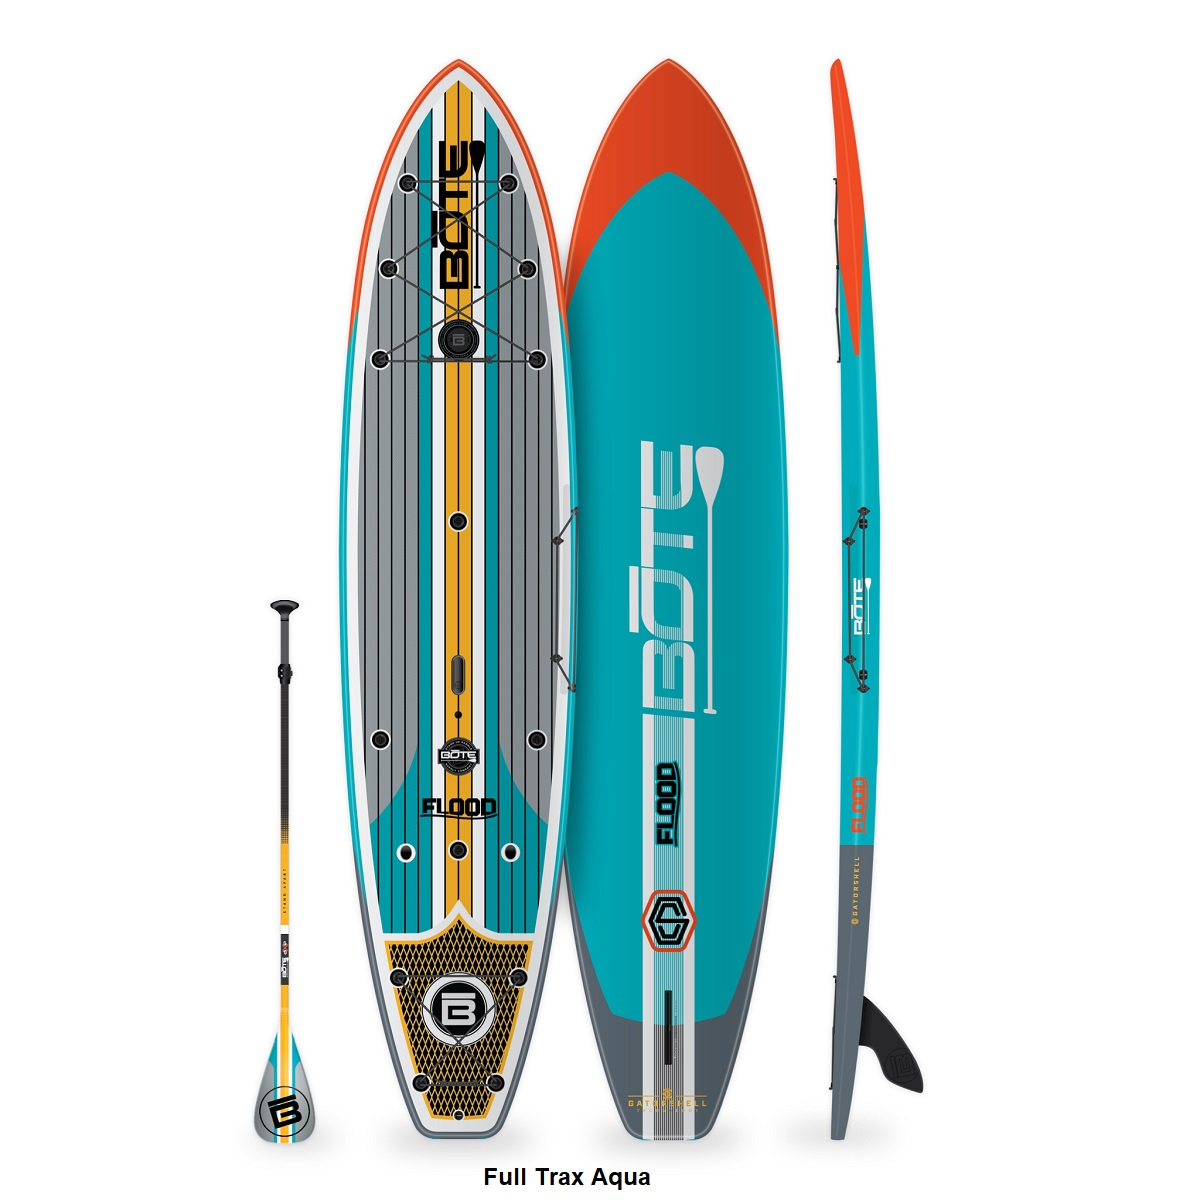 BOTE Flood 12' Paddle Board - Full Trax Aqua